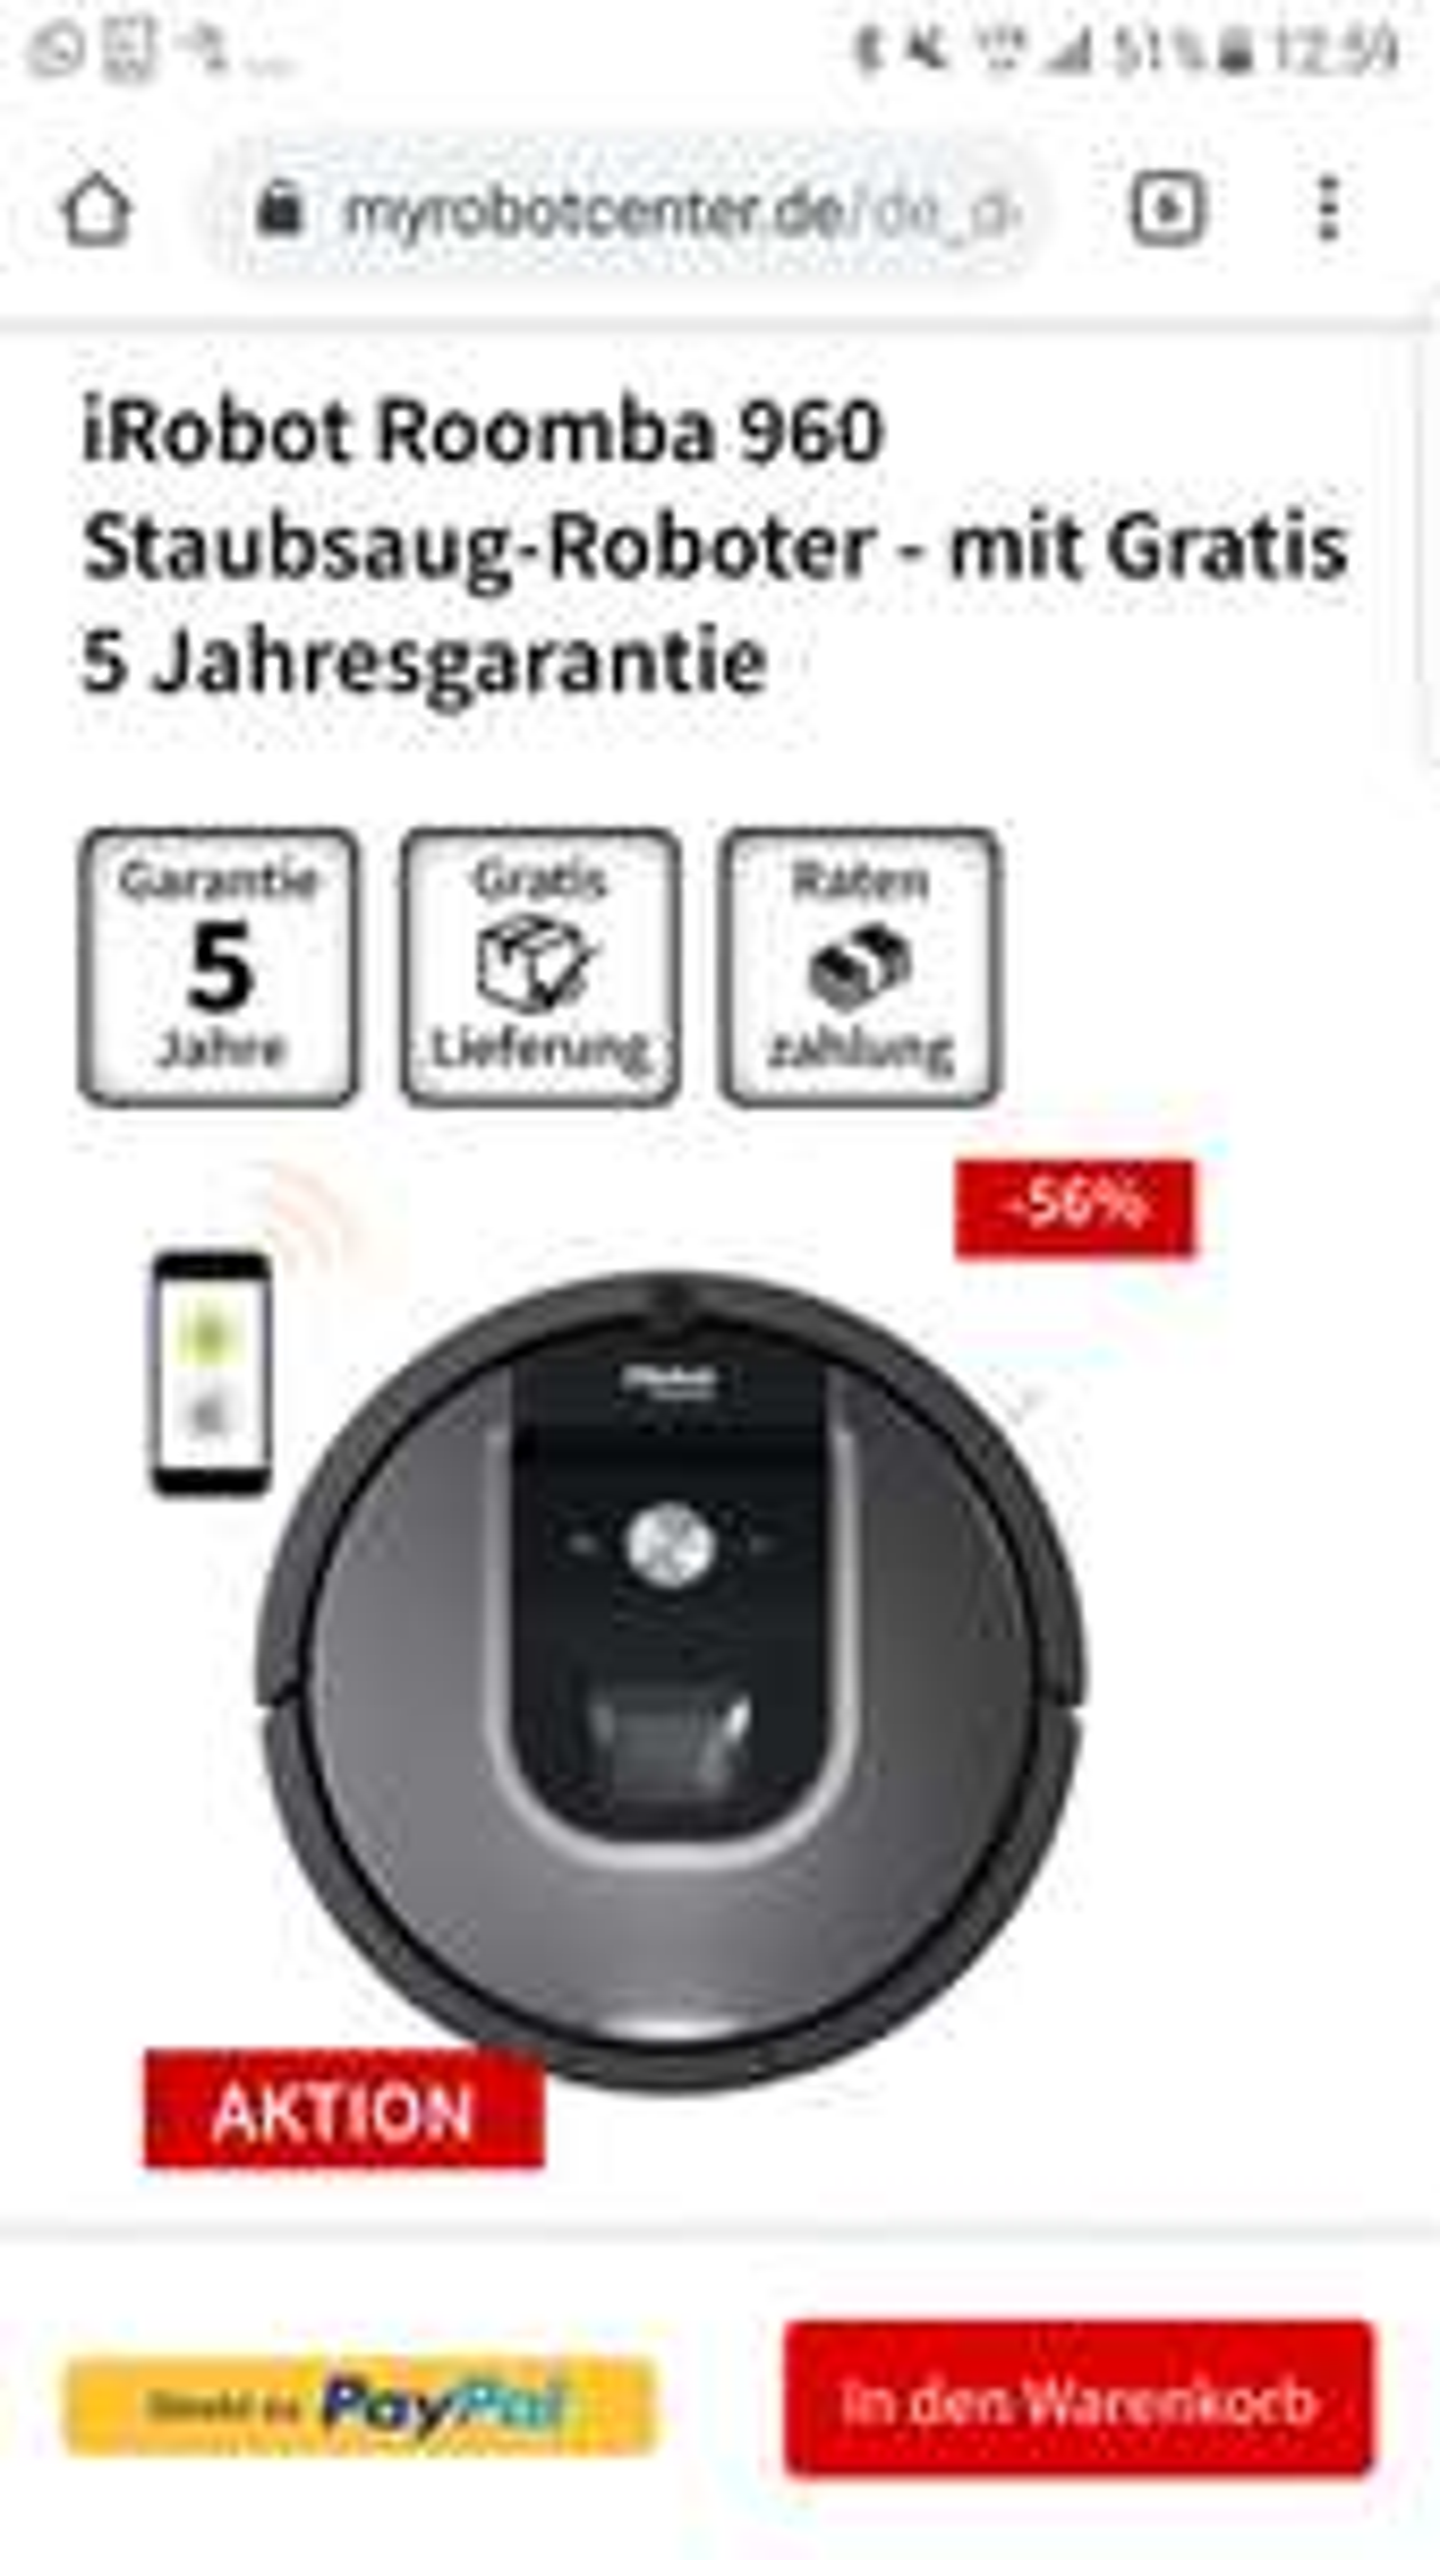 iRobot Roomba 960, inkl. 5 Jahres Garantie, [myRobotcenter]